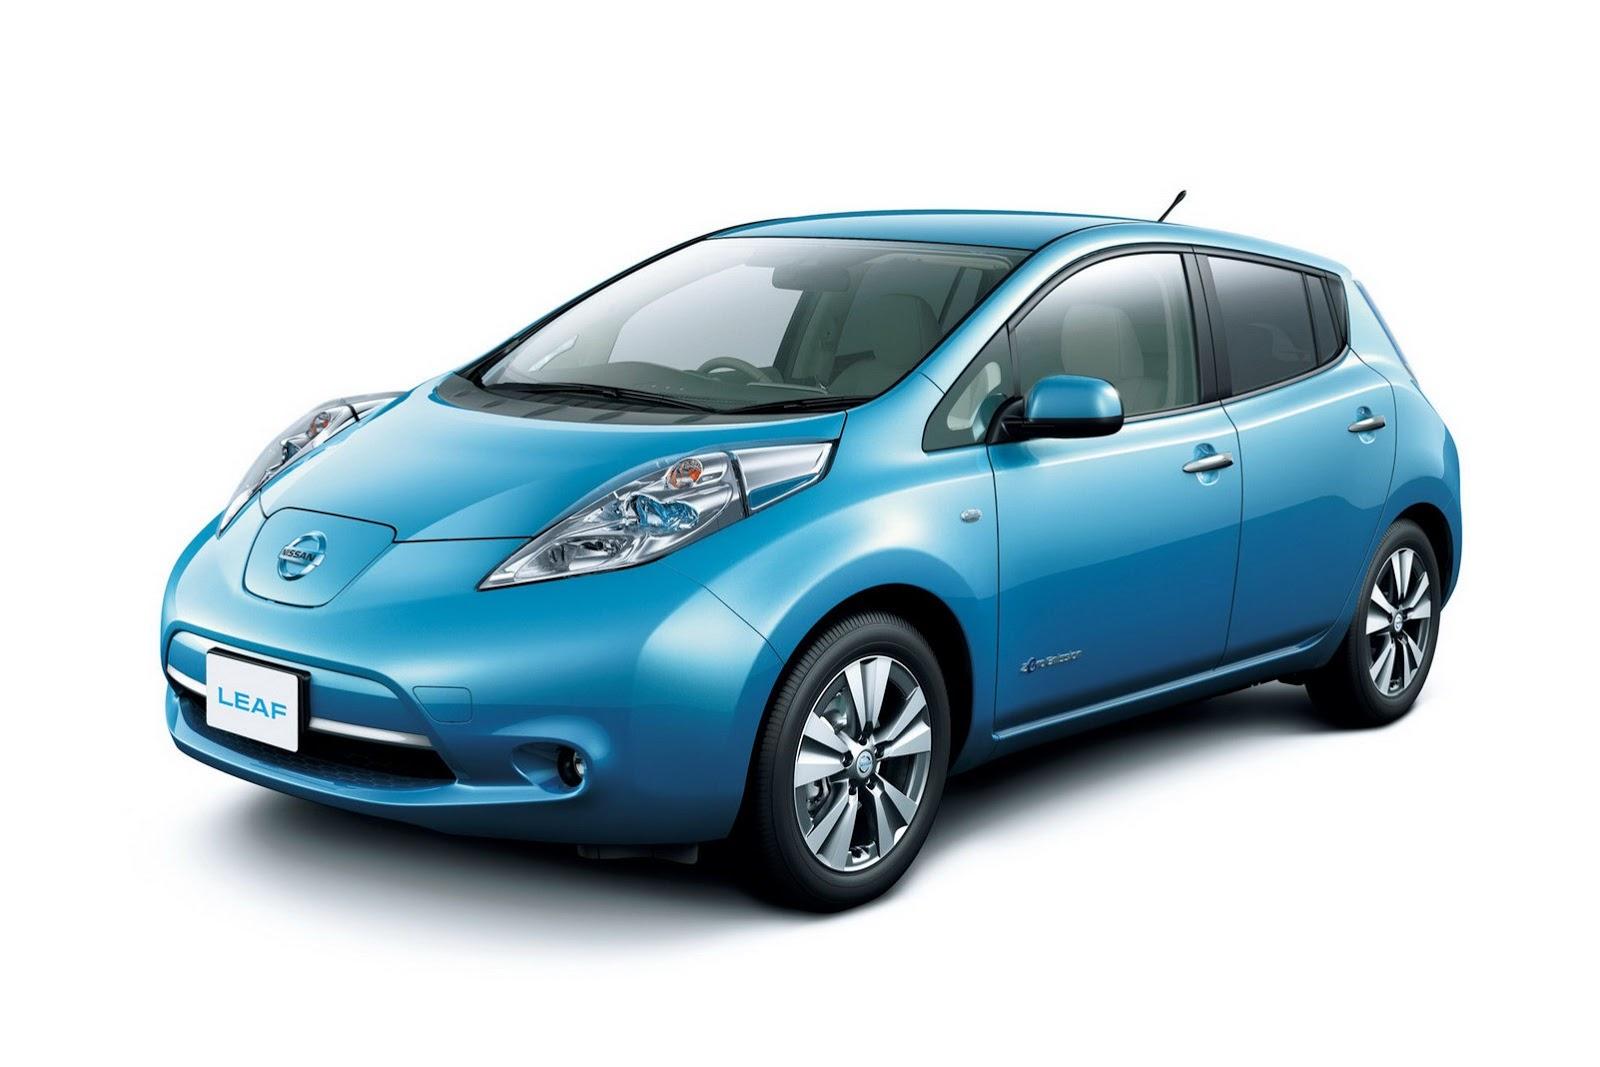 2013-Nissan-Leaf-10%25255B2%25255D.jpg